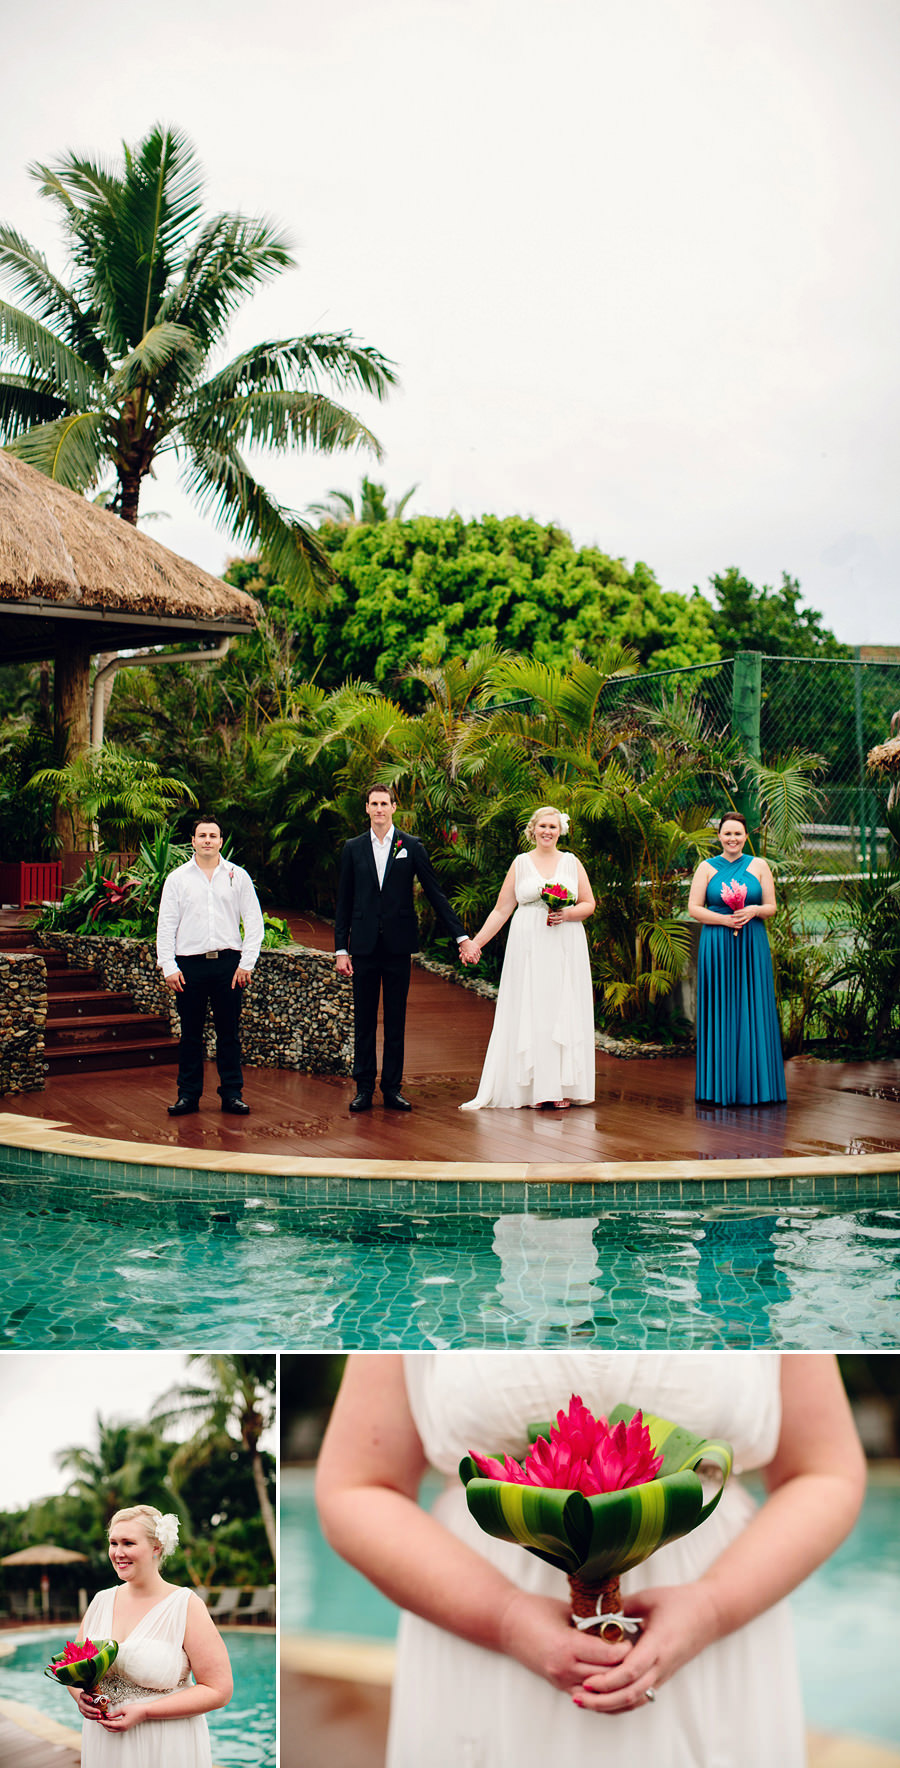 Coral Coast Wedding Photographer: Bridal party